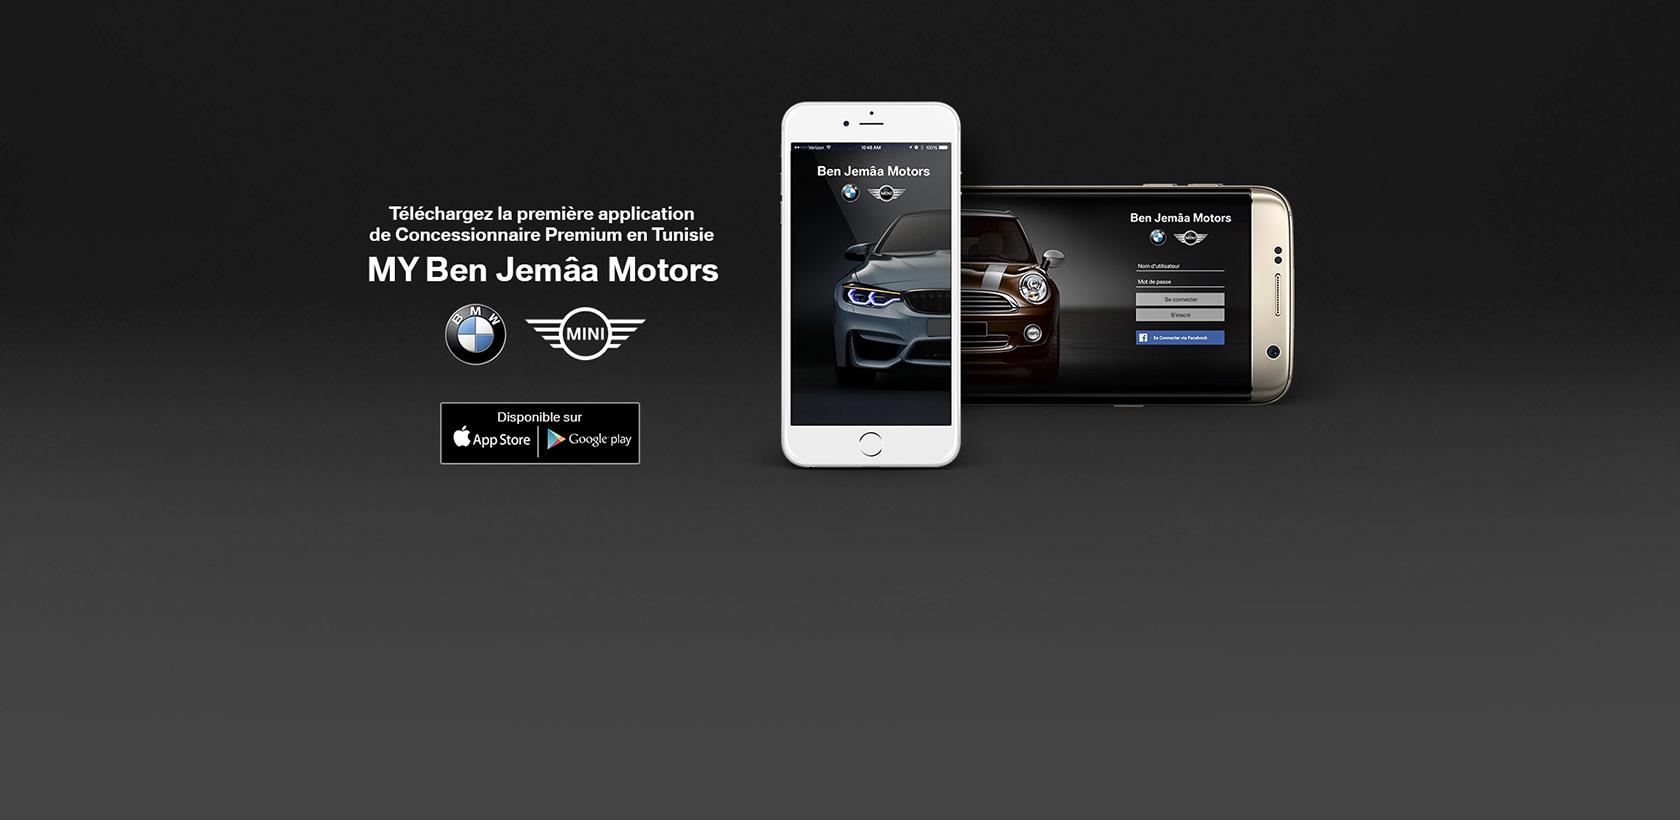 Ben Jemâa Motors lance la 1ère application